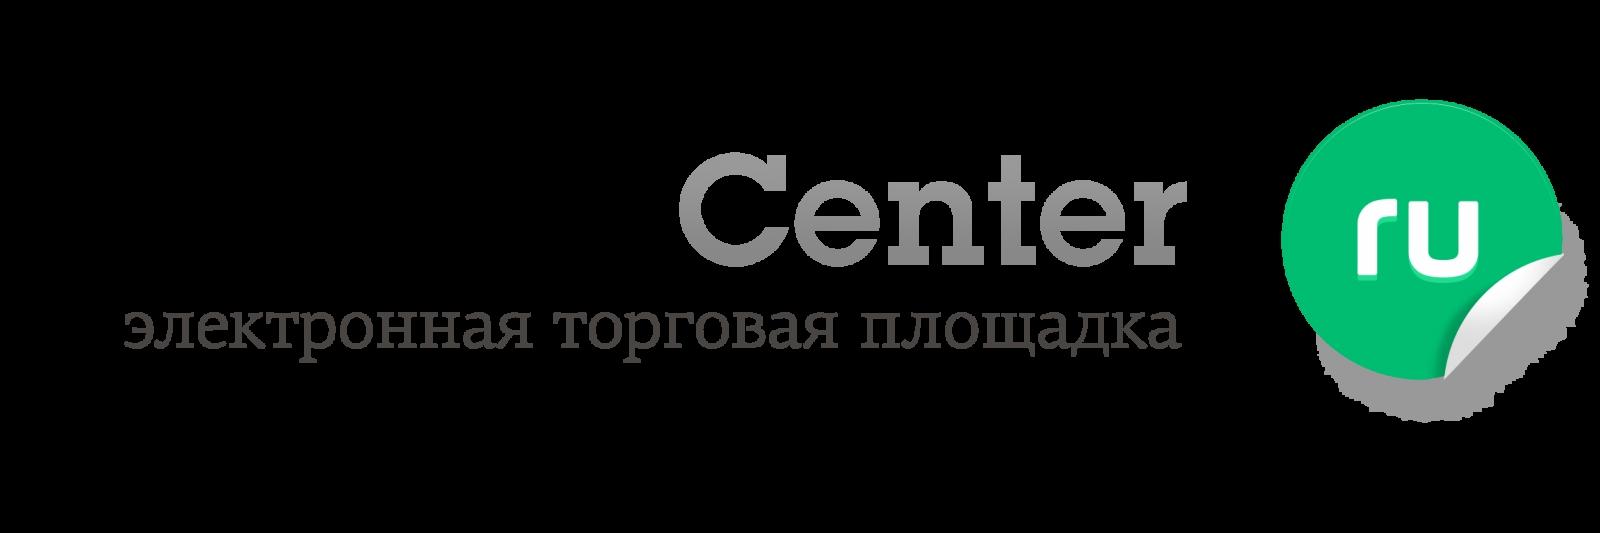 этп банкротство иркутск